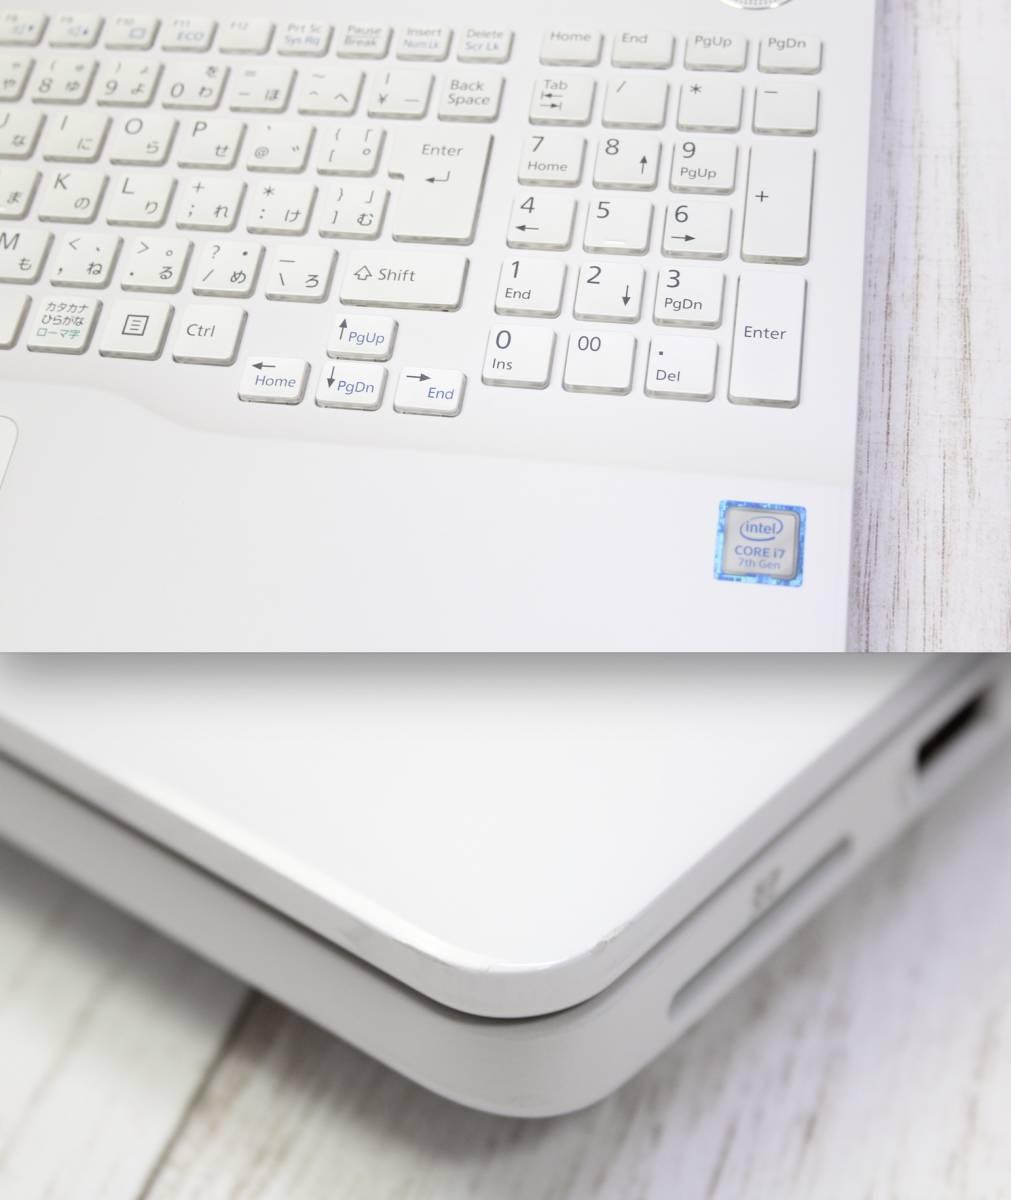 FUJITSU LIFEBOOK AH77/B1 超高性能・第7世代 Core i7-7700HQ 大容量の新品SSD500GB・メモリ16GB ・OFFICE 2016・フルHD・タッチパネル _画像4